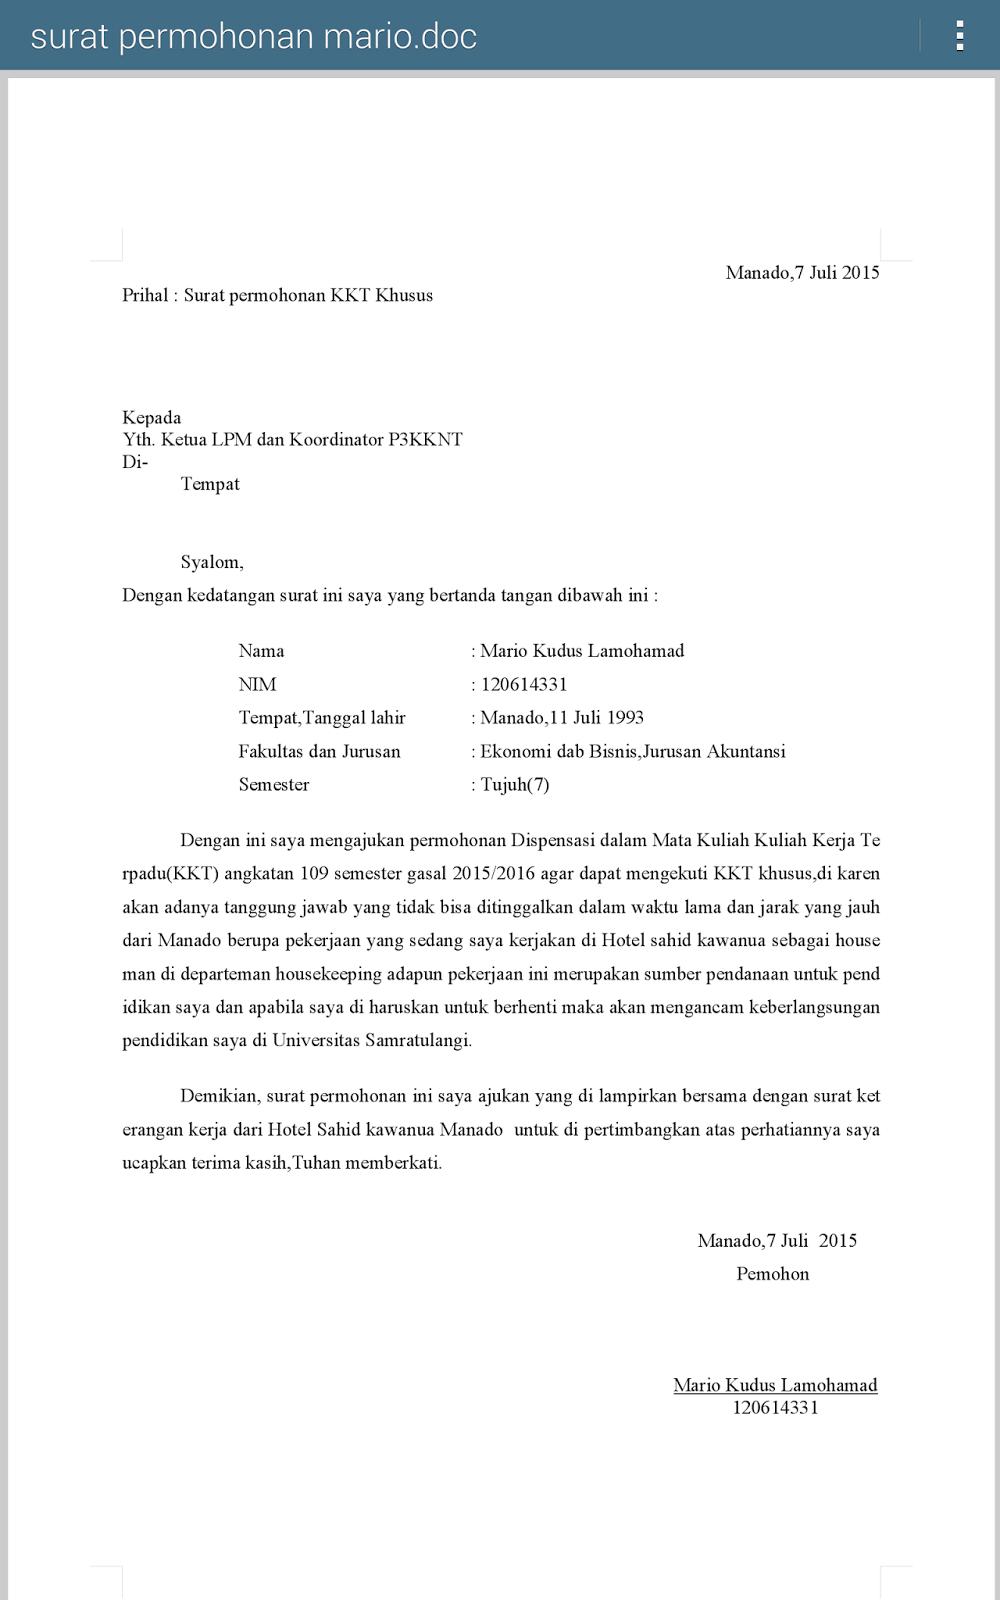 Contoh Surat Dispensasi Pembayaran Spp Kuliah Contoh Surat